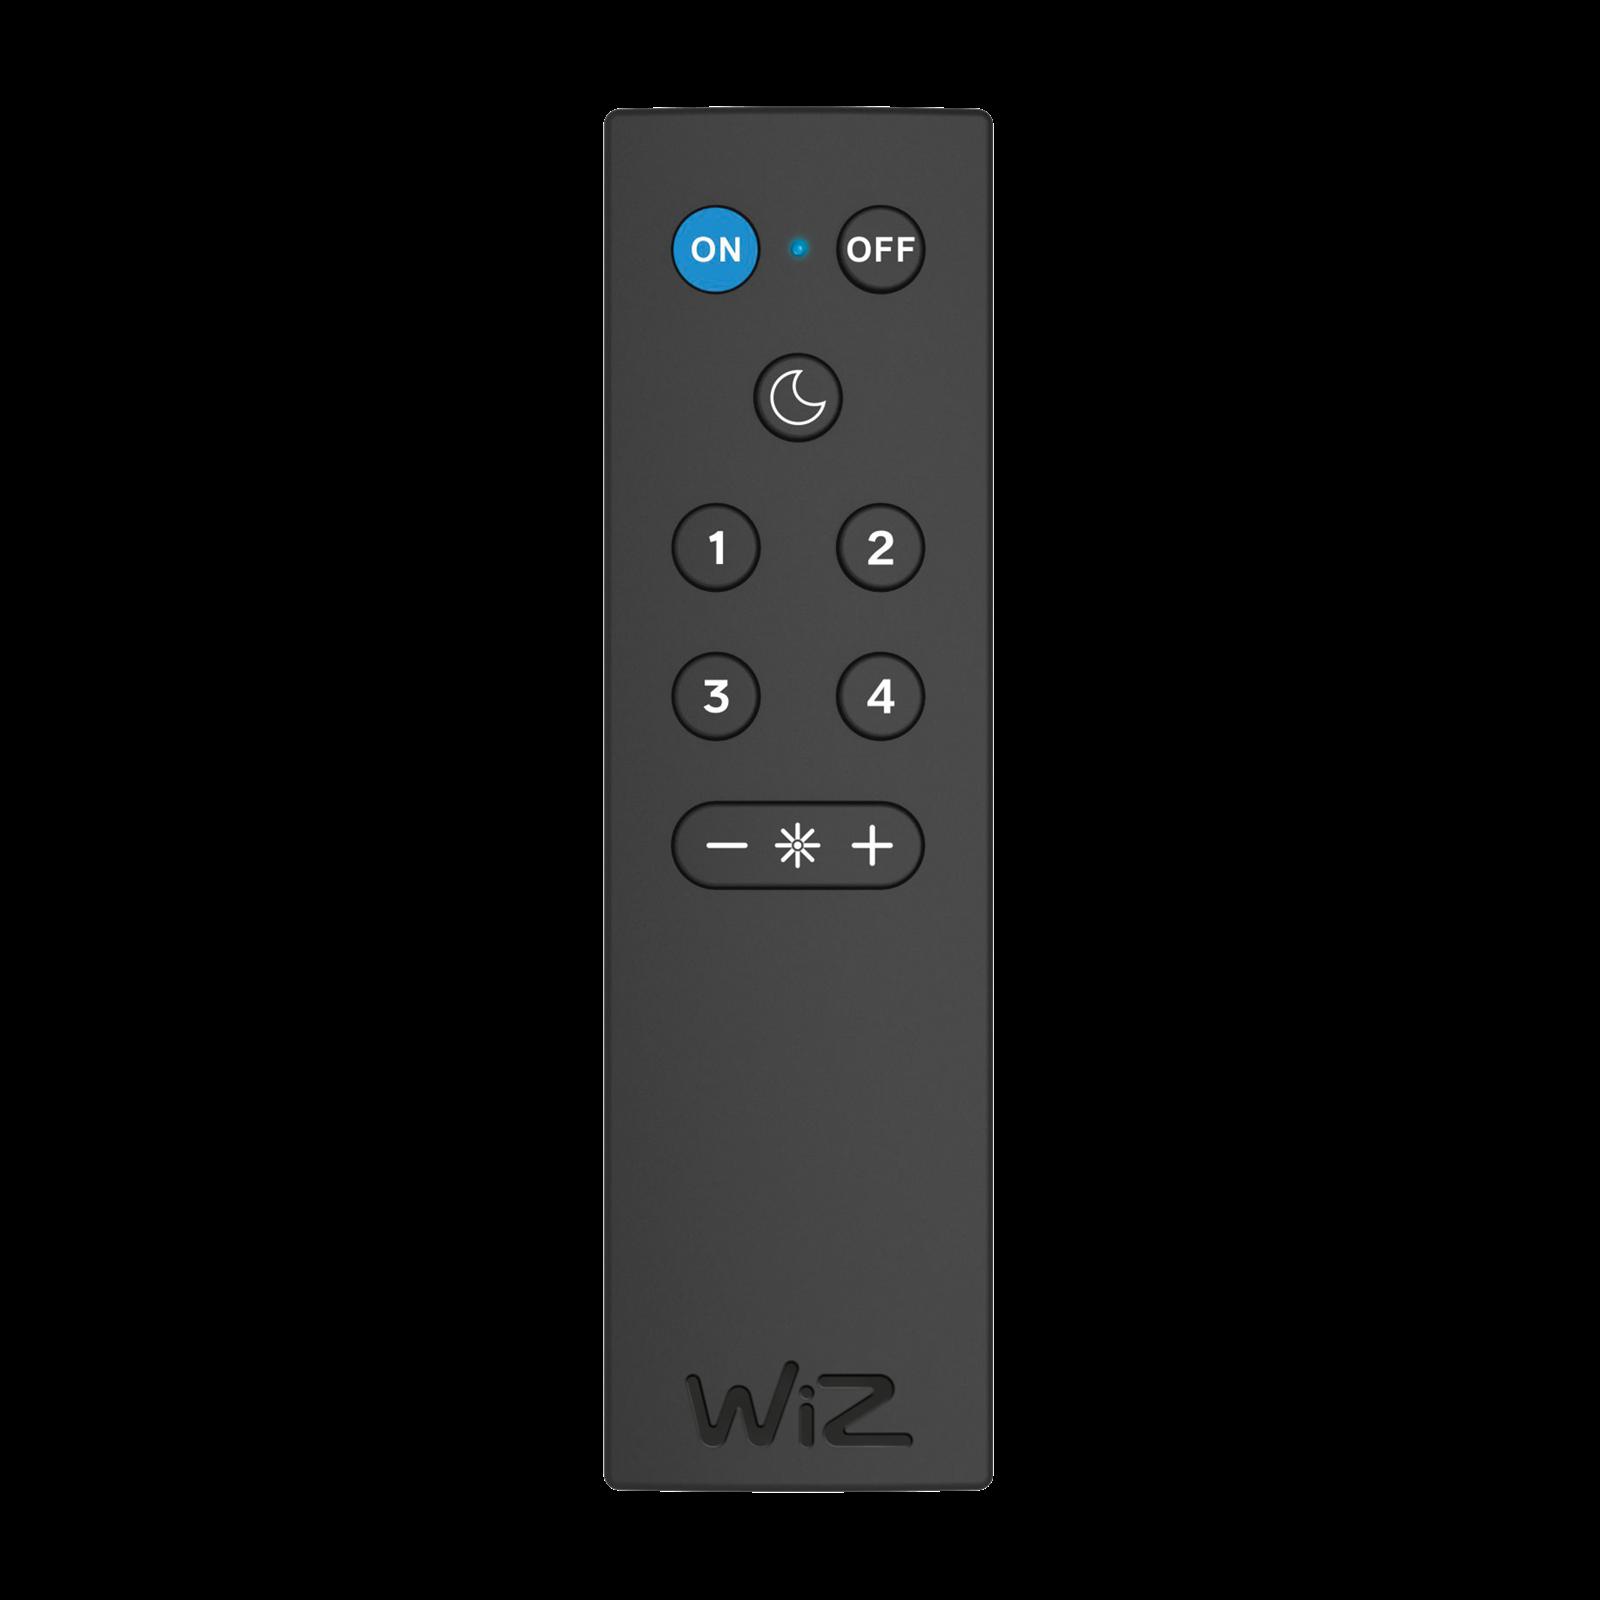 WiZ Black Wi-Fi Remote Control